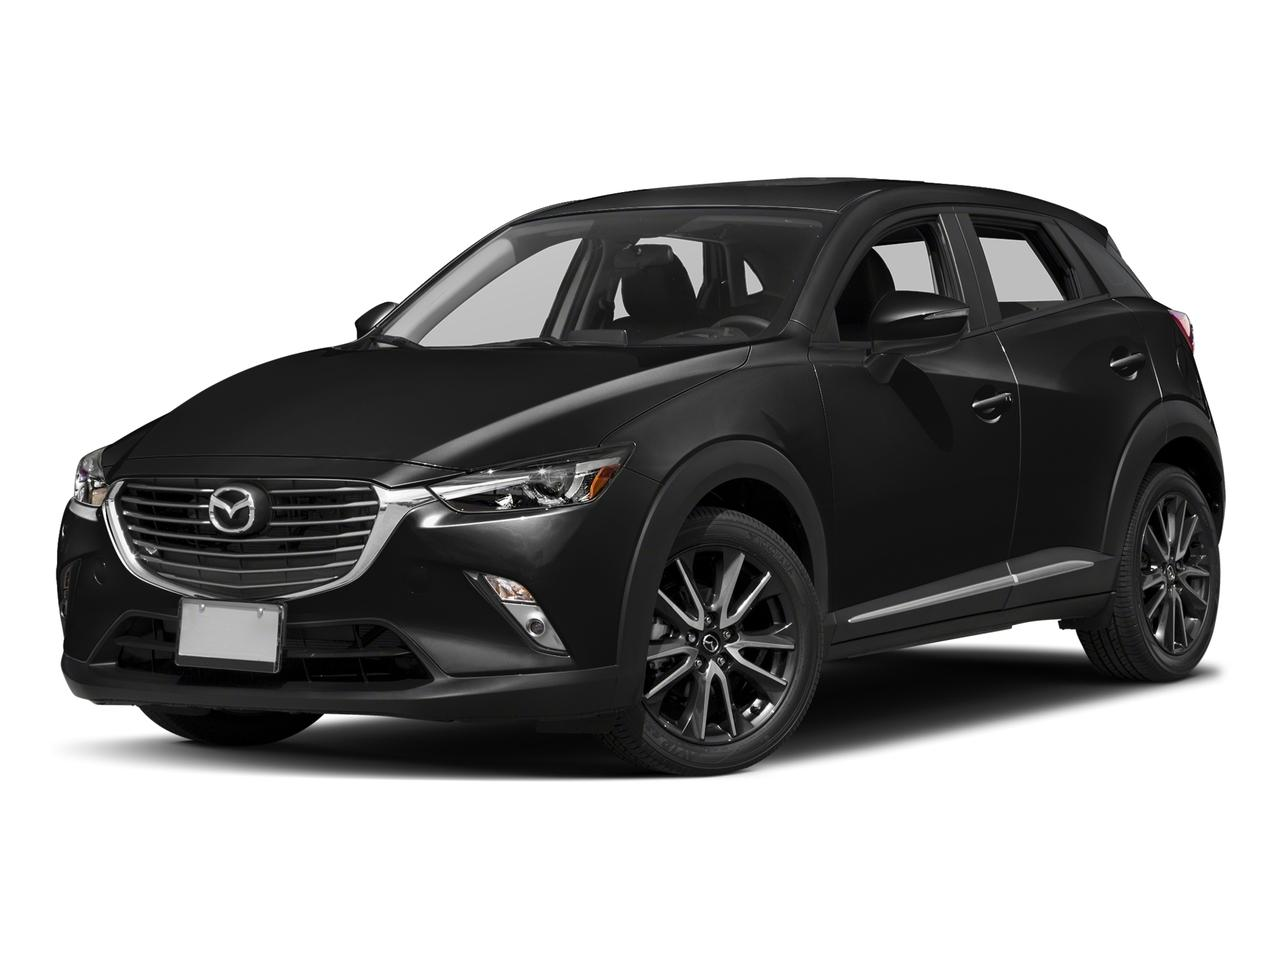 2017 Mazda CX-3 Vehicle Photo in Tucson, AZ 85705